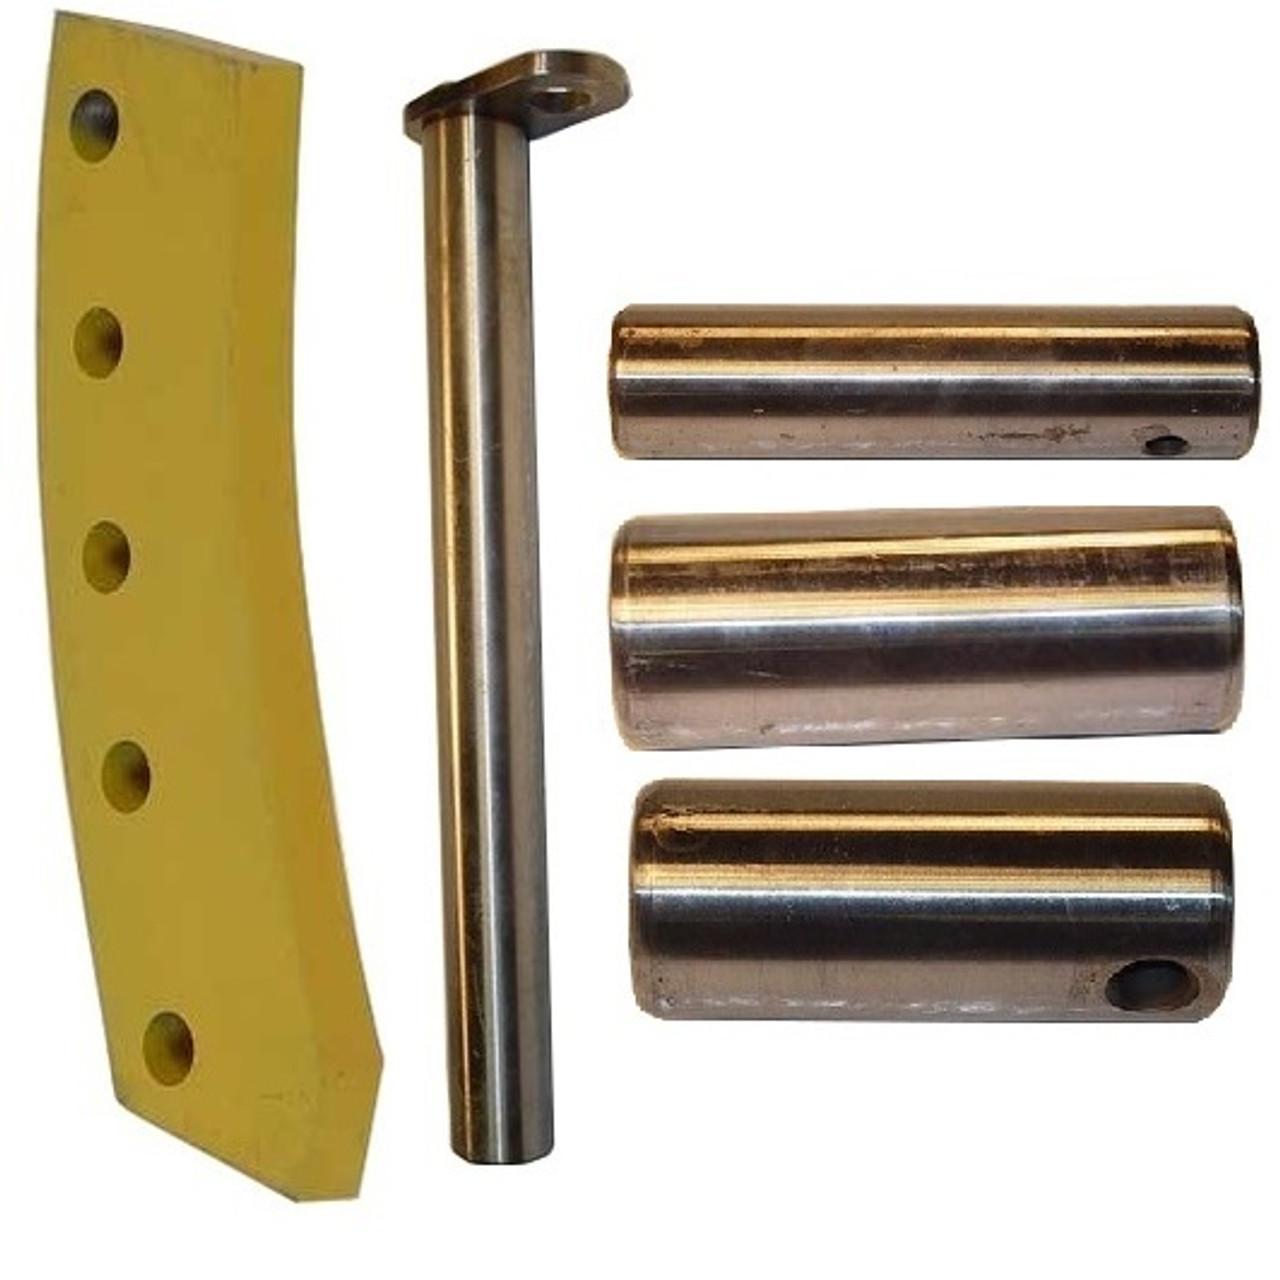 Dresser & International Harvester Parts | Dozer Parts at Broken Tractor